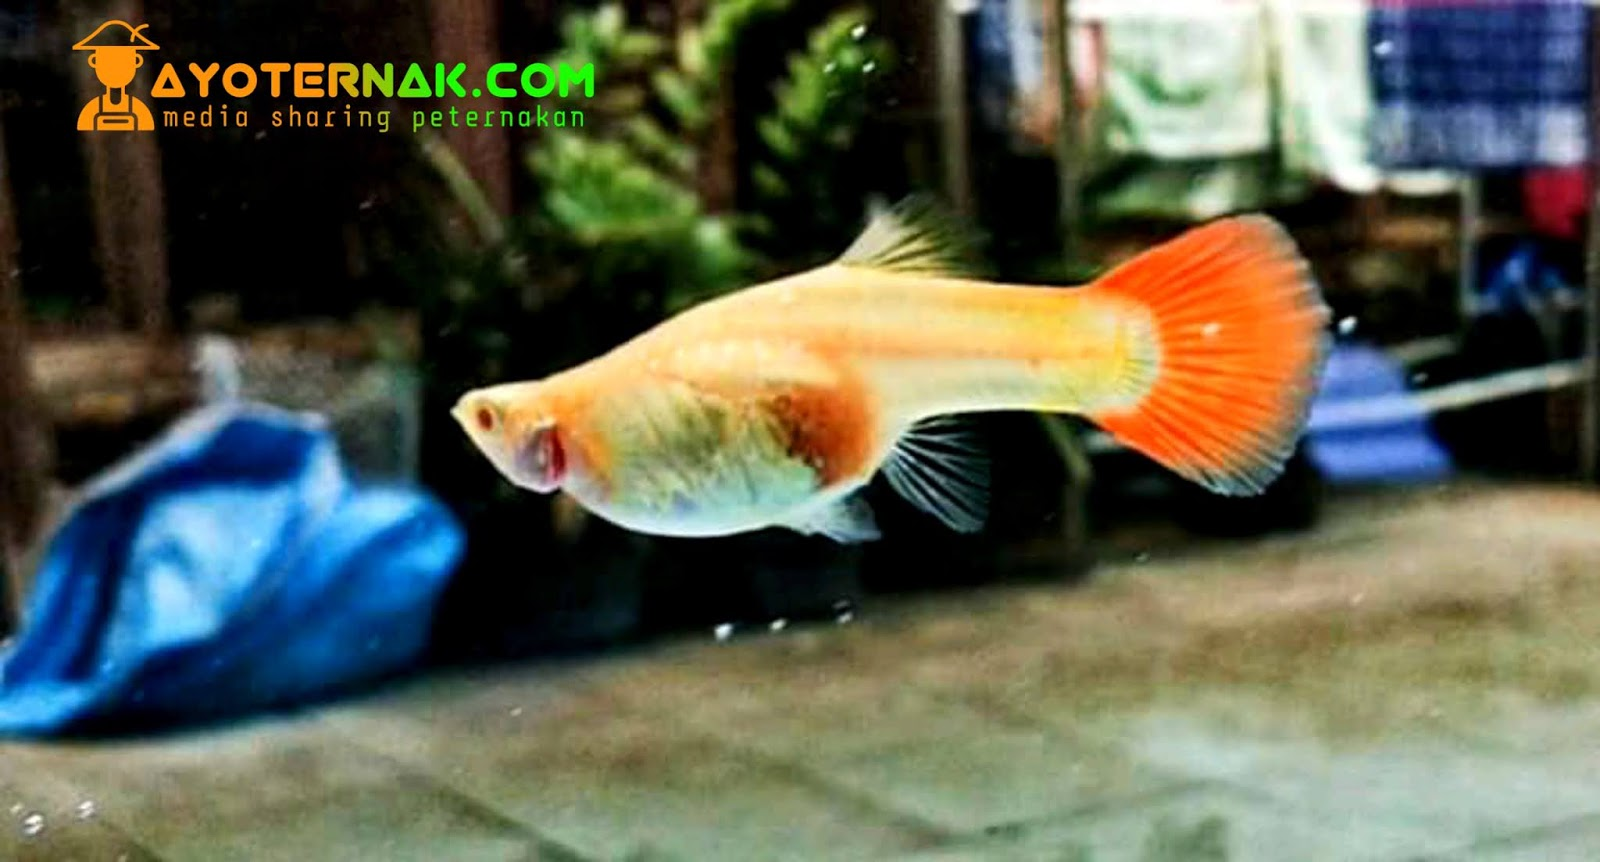 6 Penyebab Ikan Guppy Diam Didasar Aquarium Atau Kolam Ayo Ternak